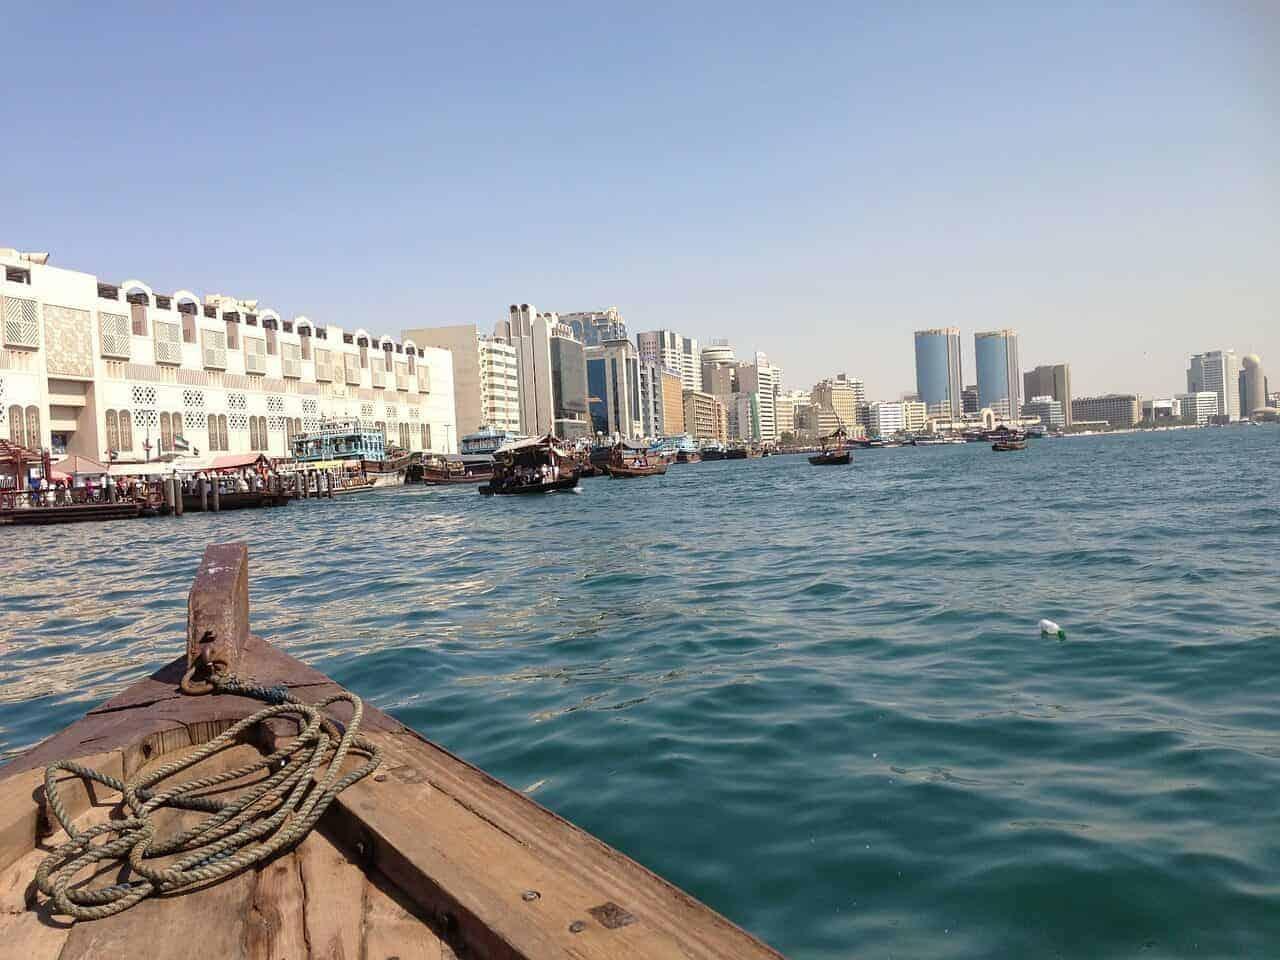 Dhow Boat on Dubai Creek